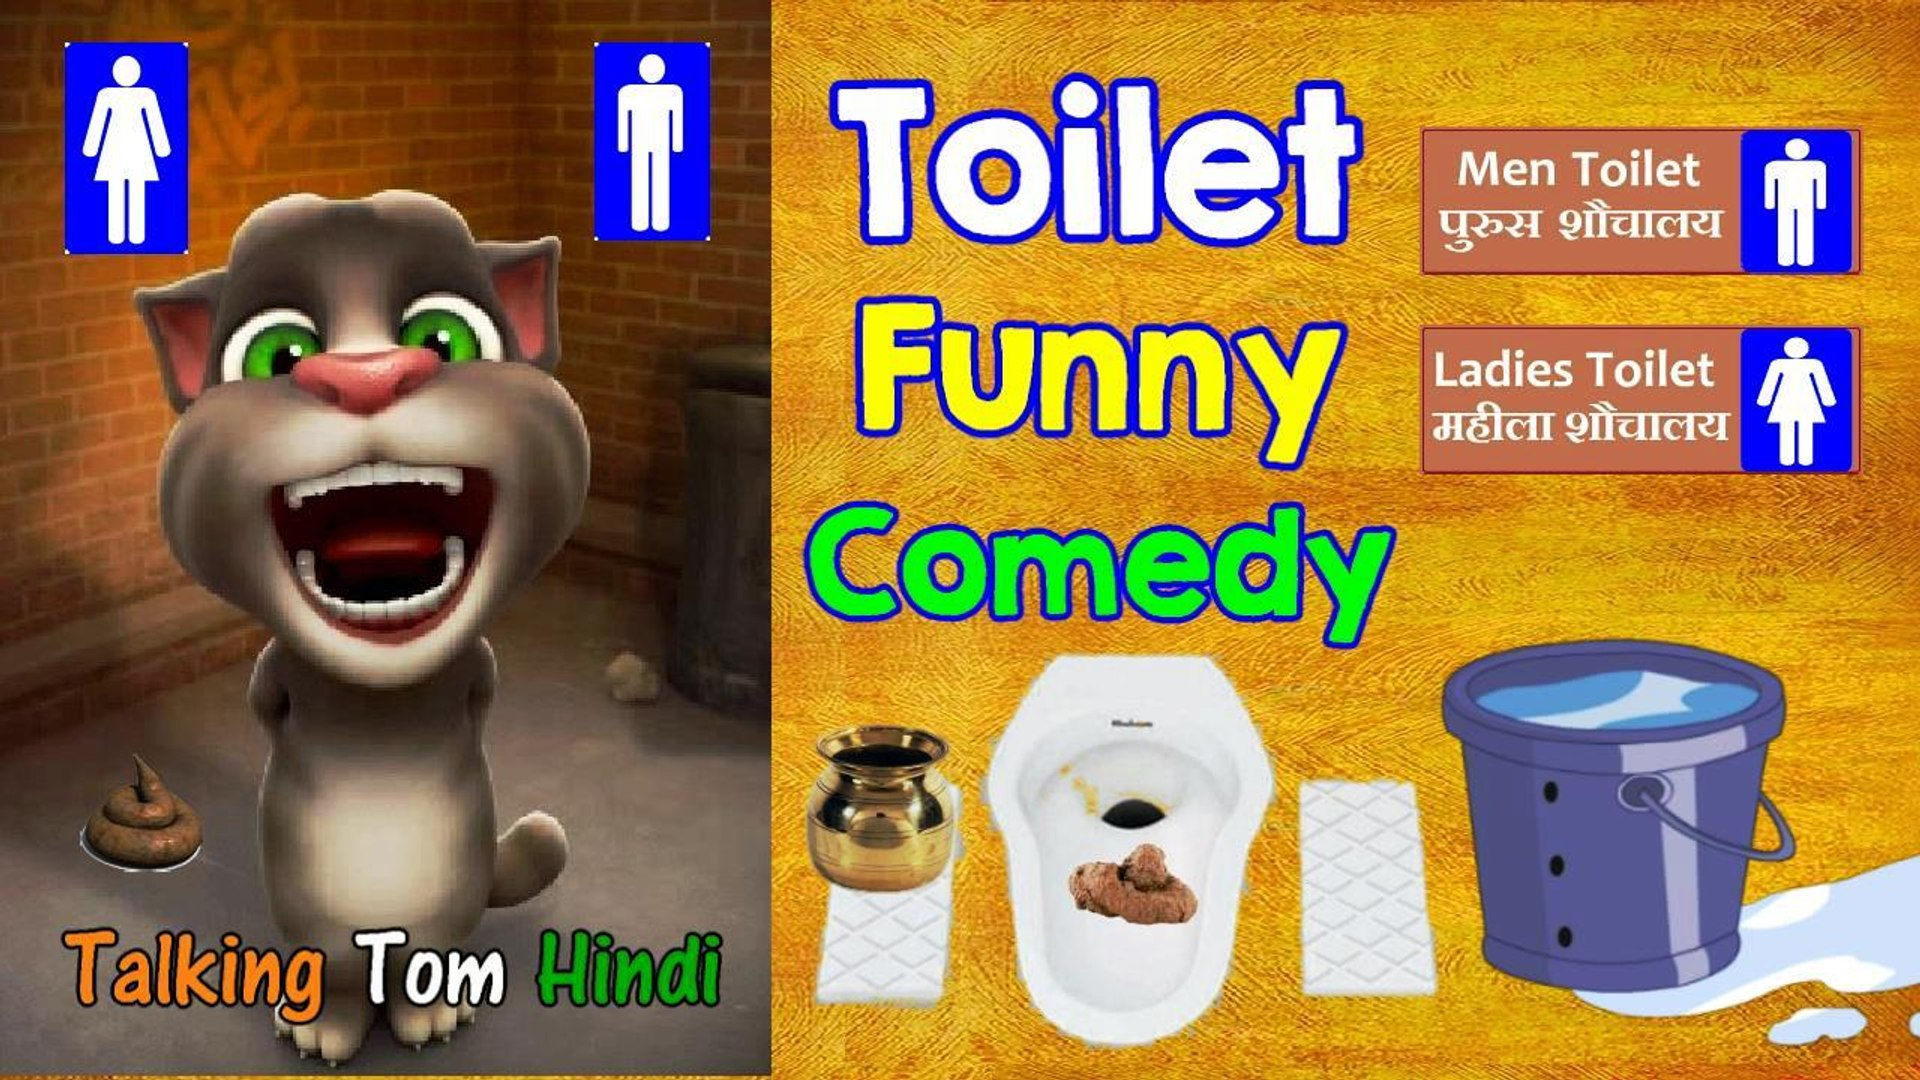 Toilet Ek Katha Funny Comedy - Talking Tom Hindi - Talking Tom Funny Videos